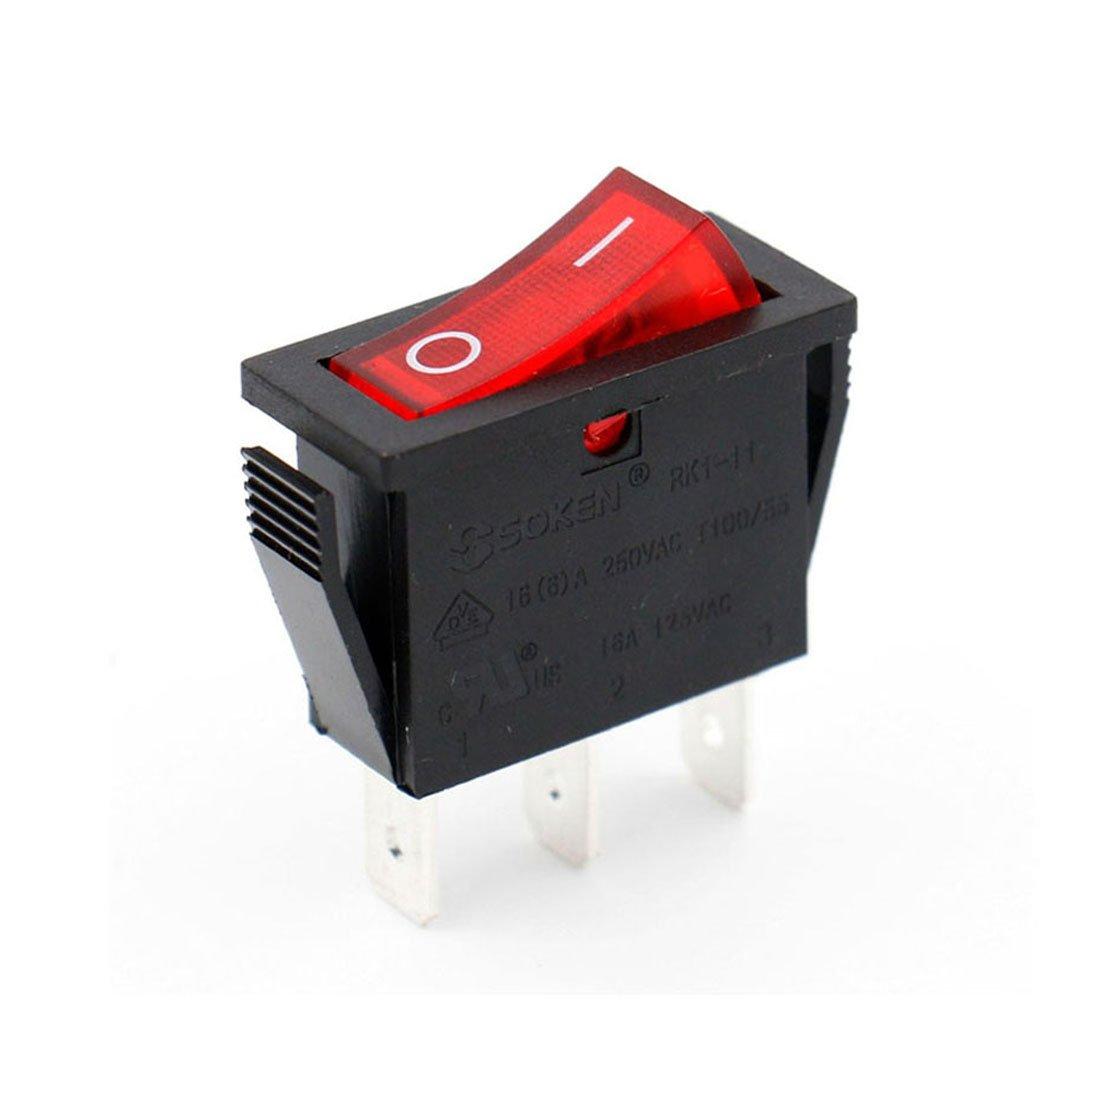 Baomain Snap-in Rocker Switch ON-Off SPST 250V 16A 125V 16A 3 Terminal Red Light UL TüV Certified